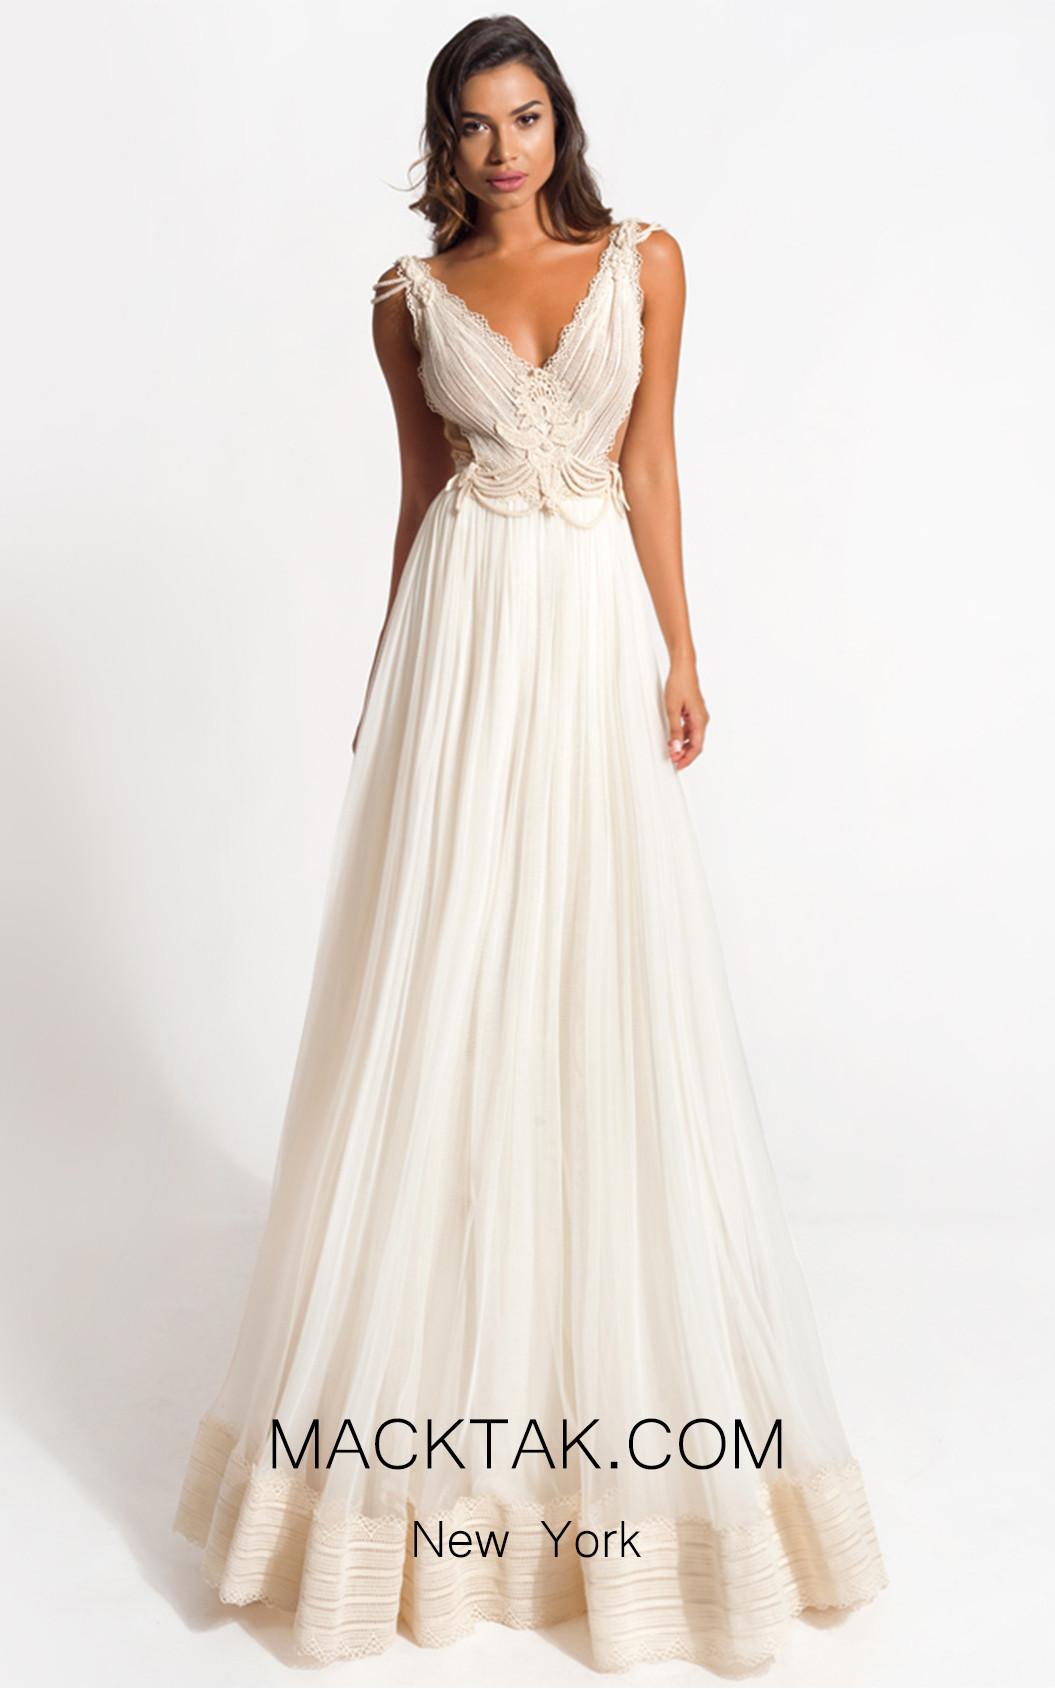 Zolotas Atelier Aegle Front Evening Dress